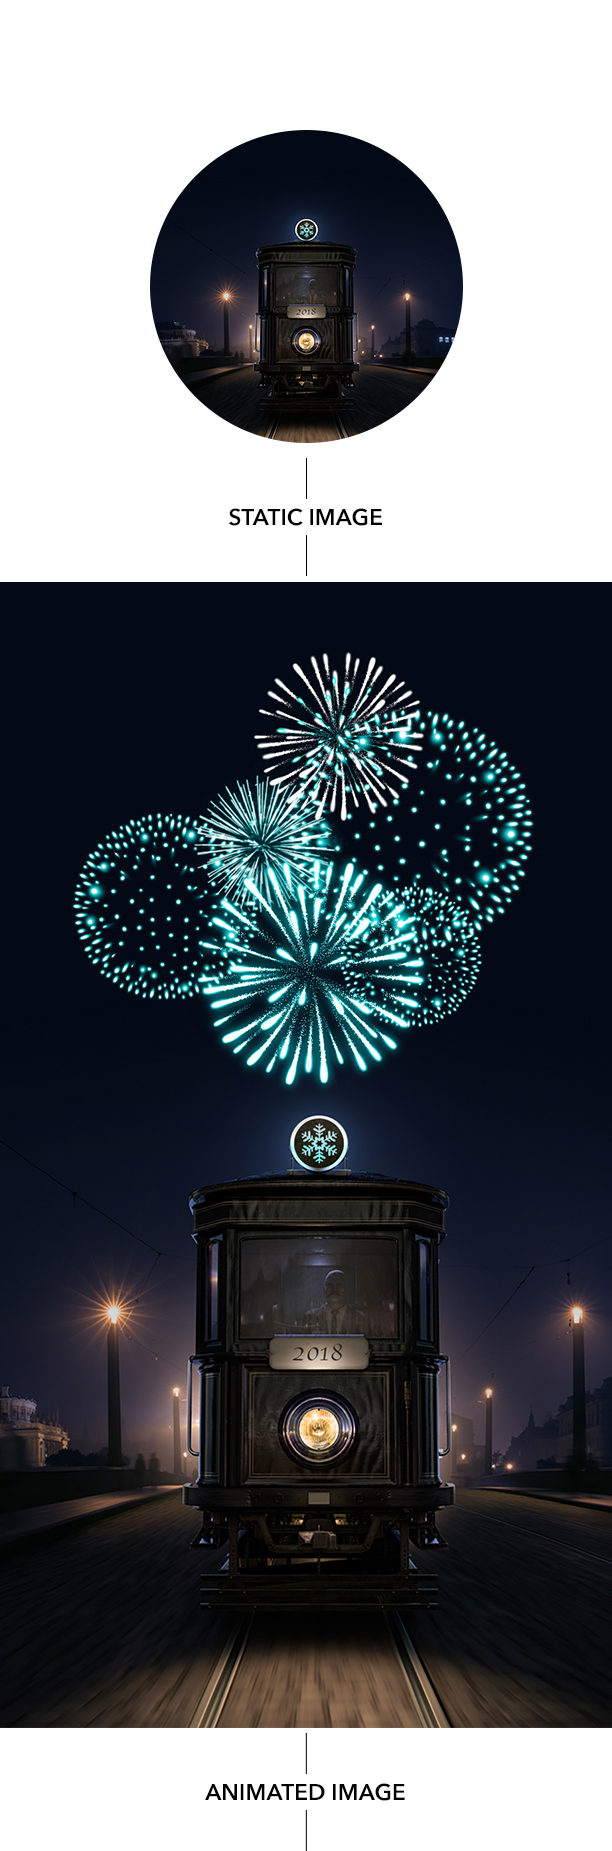 Gif Animated Fireworks Photoshop Action - 12